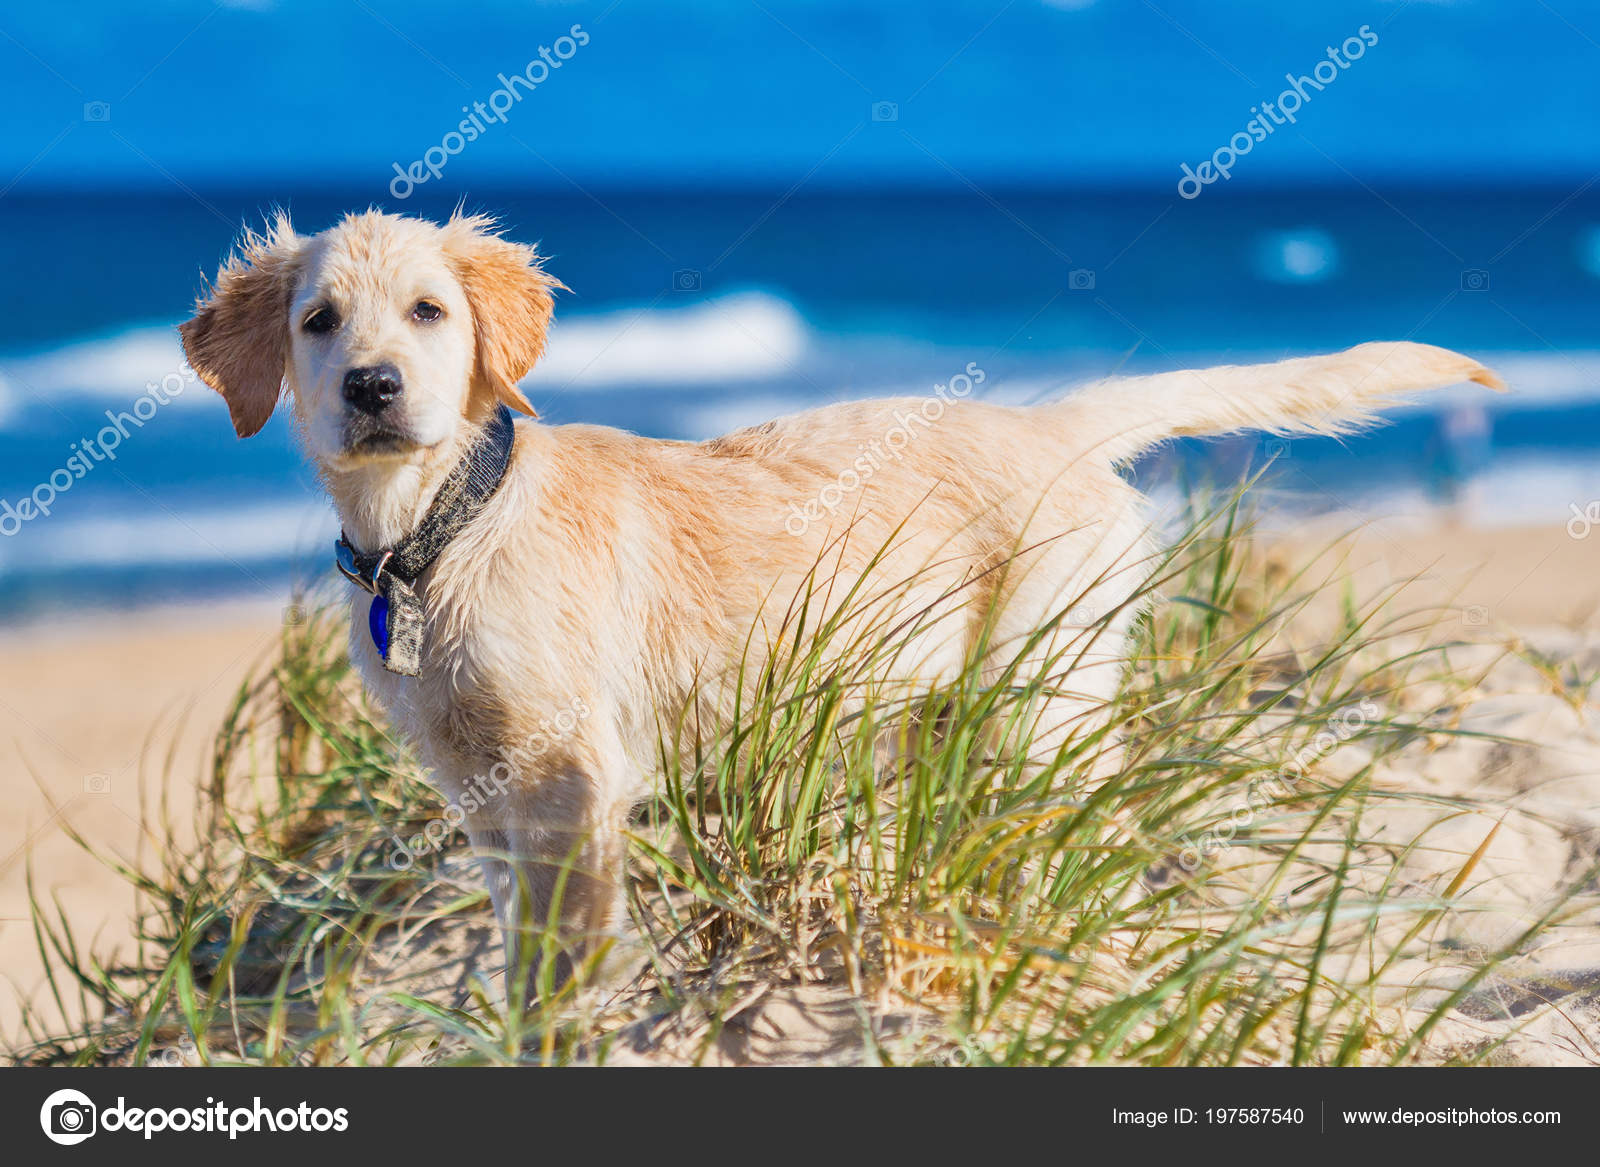 Golden Retriever Puppy Exploring Beach Surroundings Stock Photo C Mvaligursky 197587540